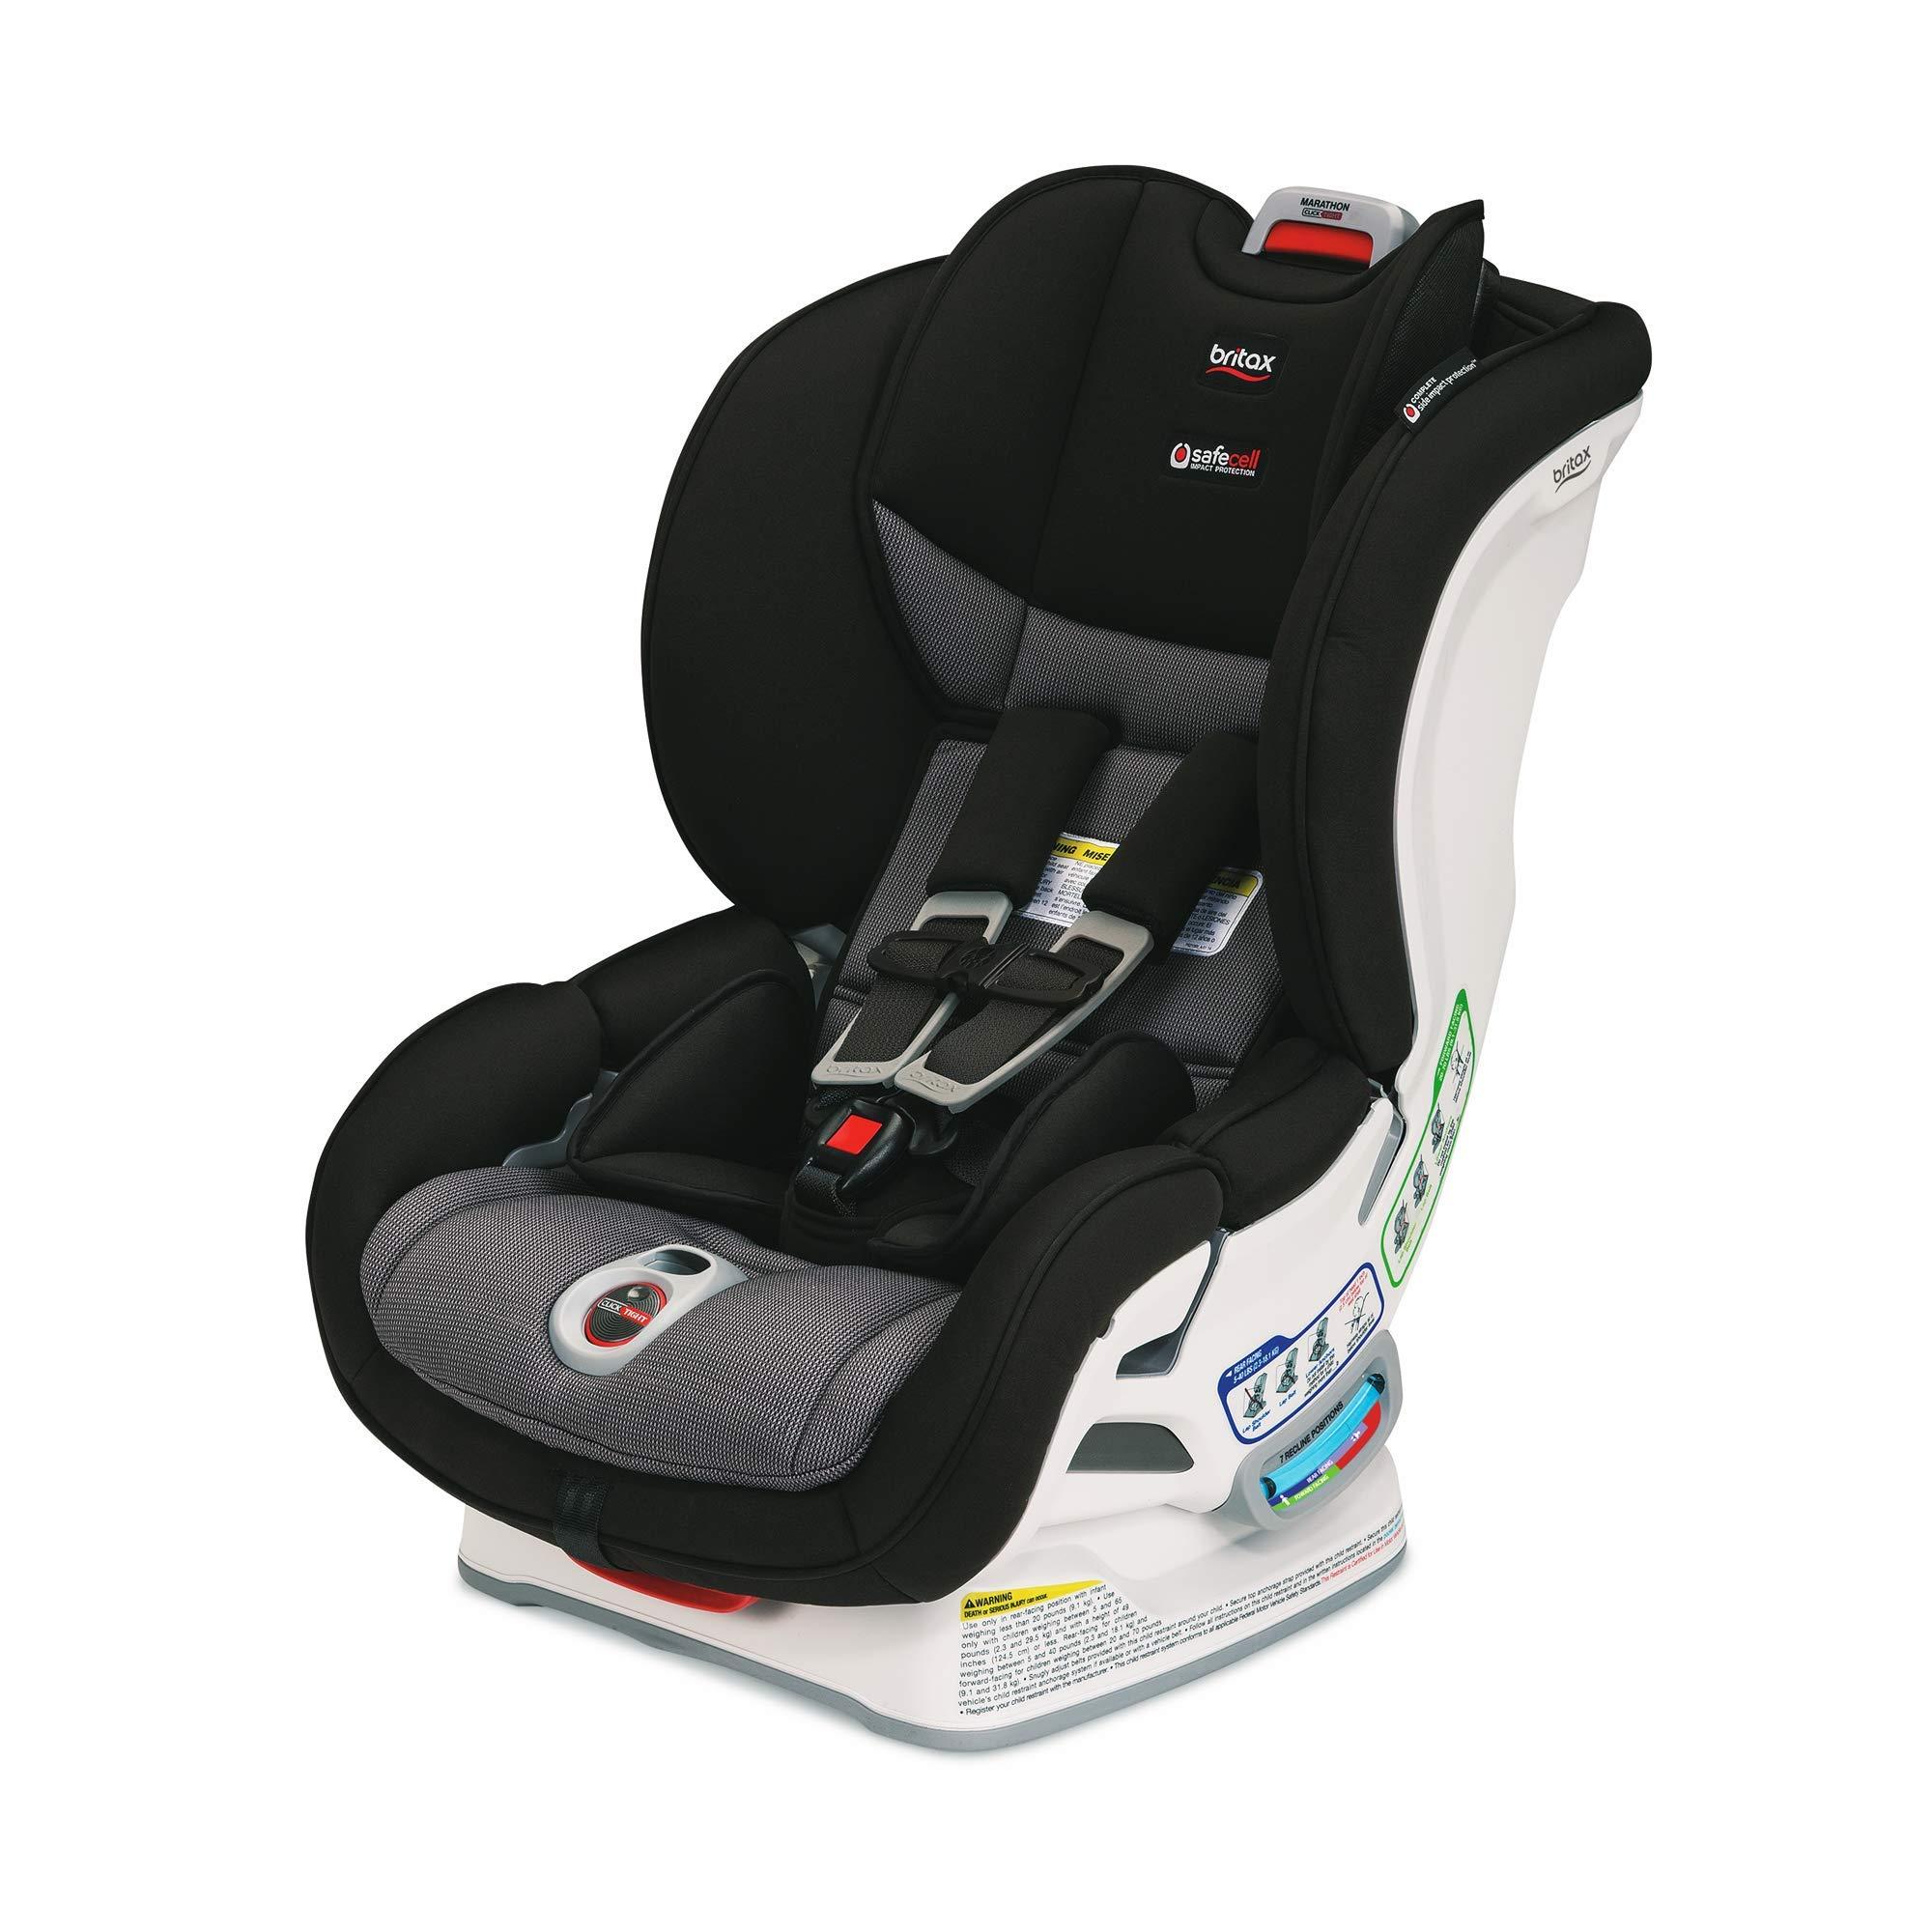 Amazon.com : Britax Marathon ClickTight Convertible Car Seat, Verve : Baby